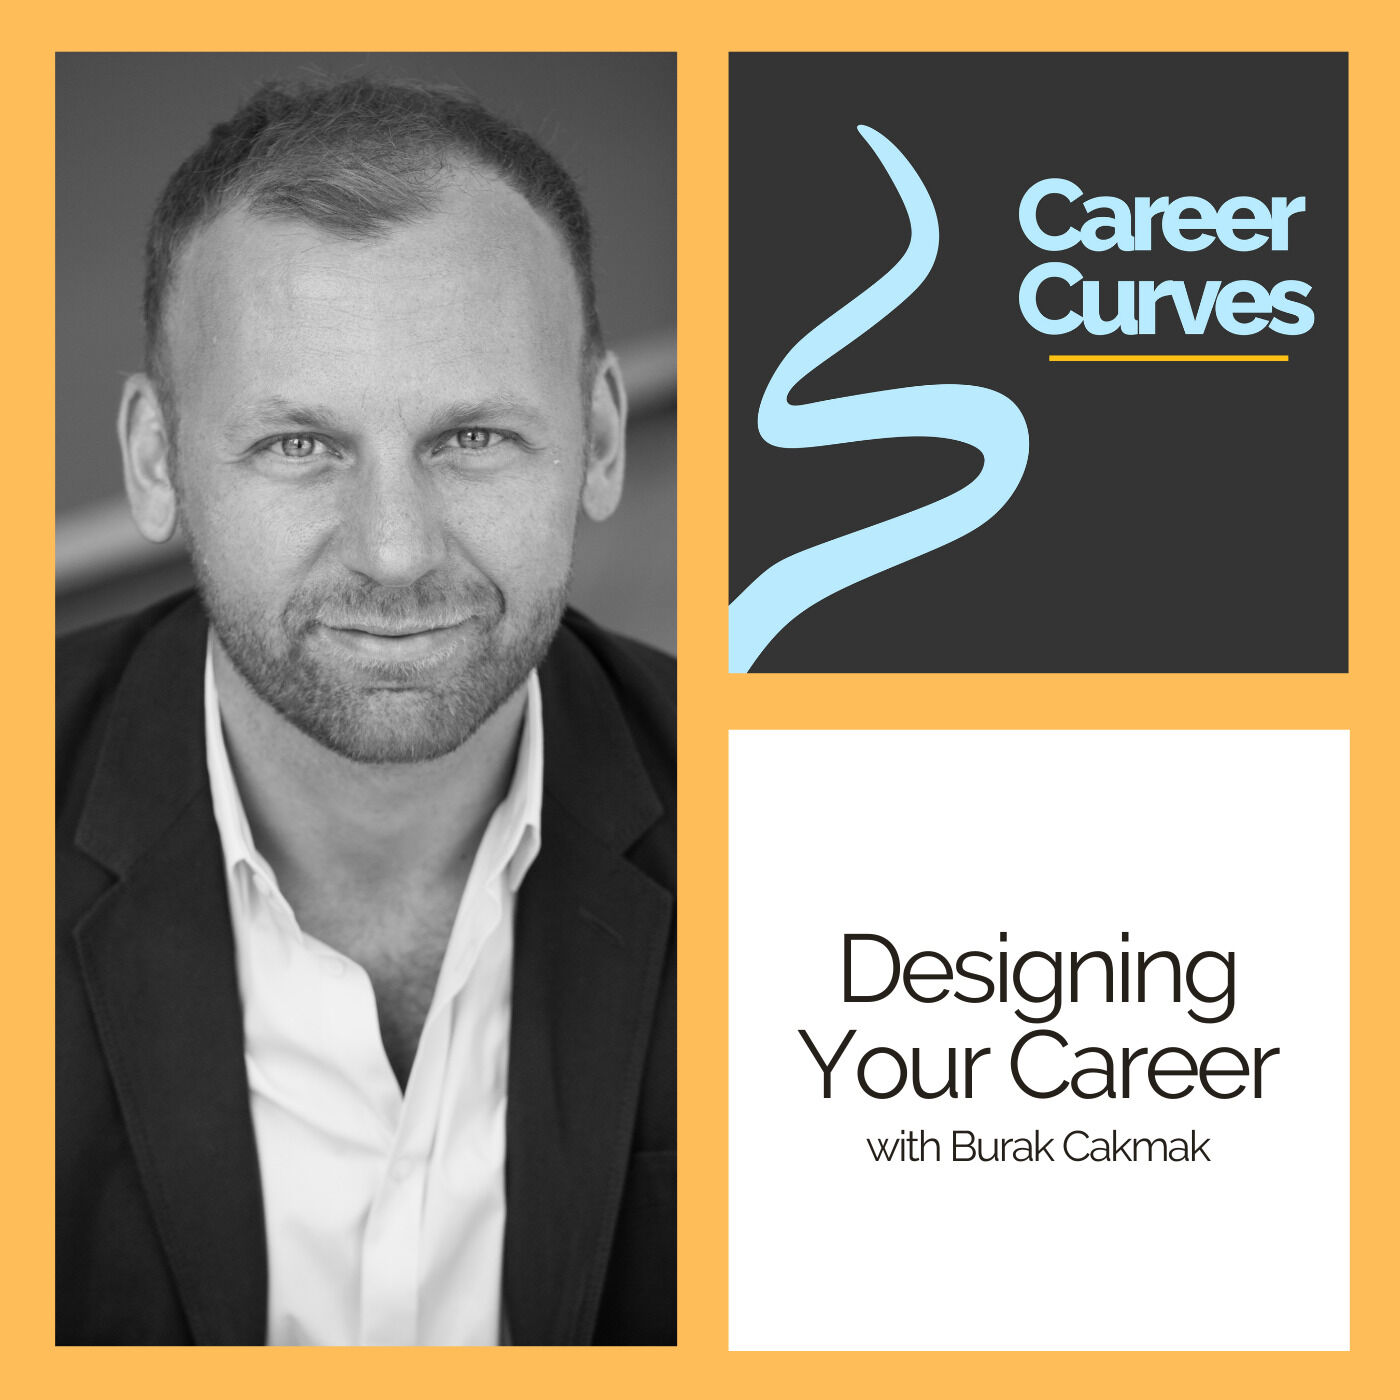 Designing Your Career with Burak Cakmak